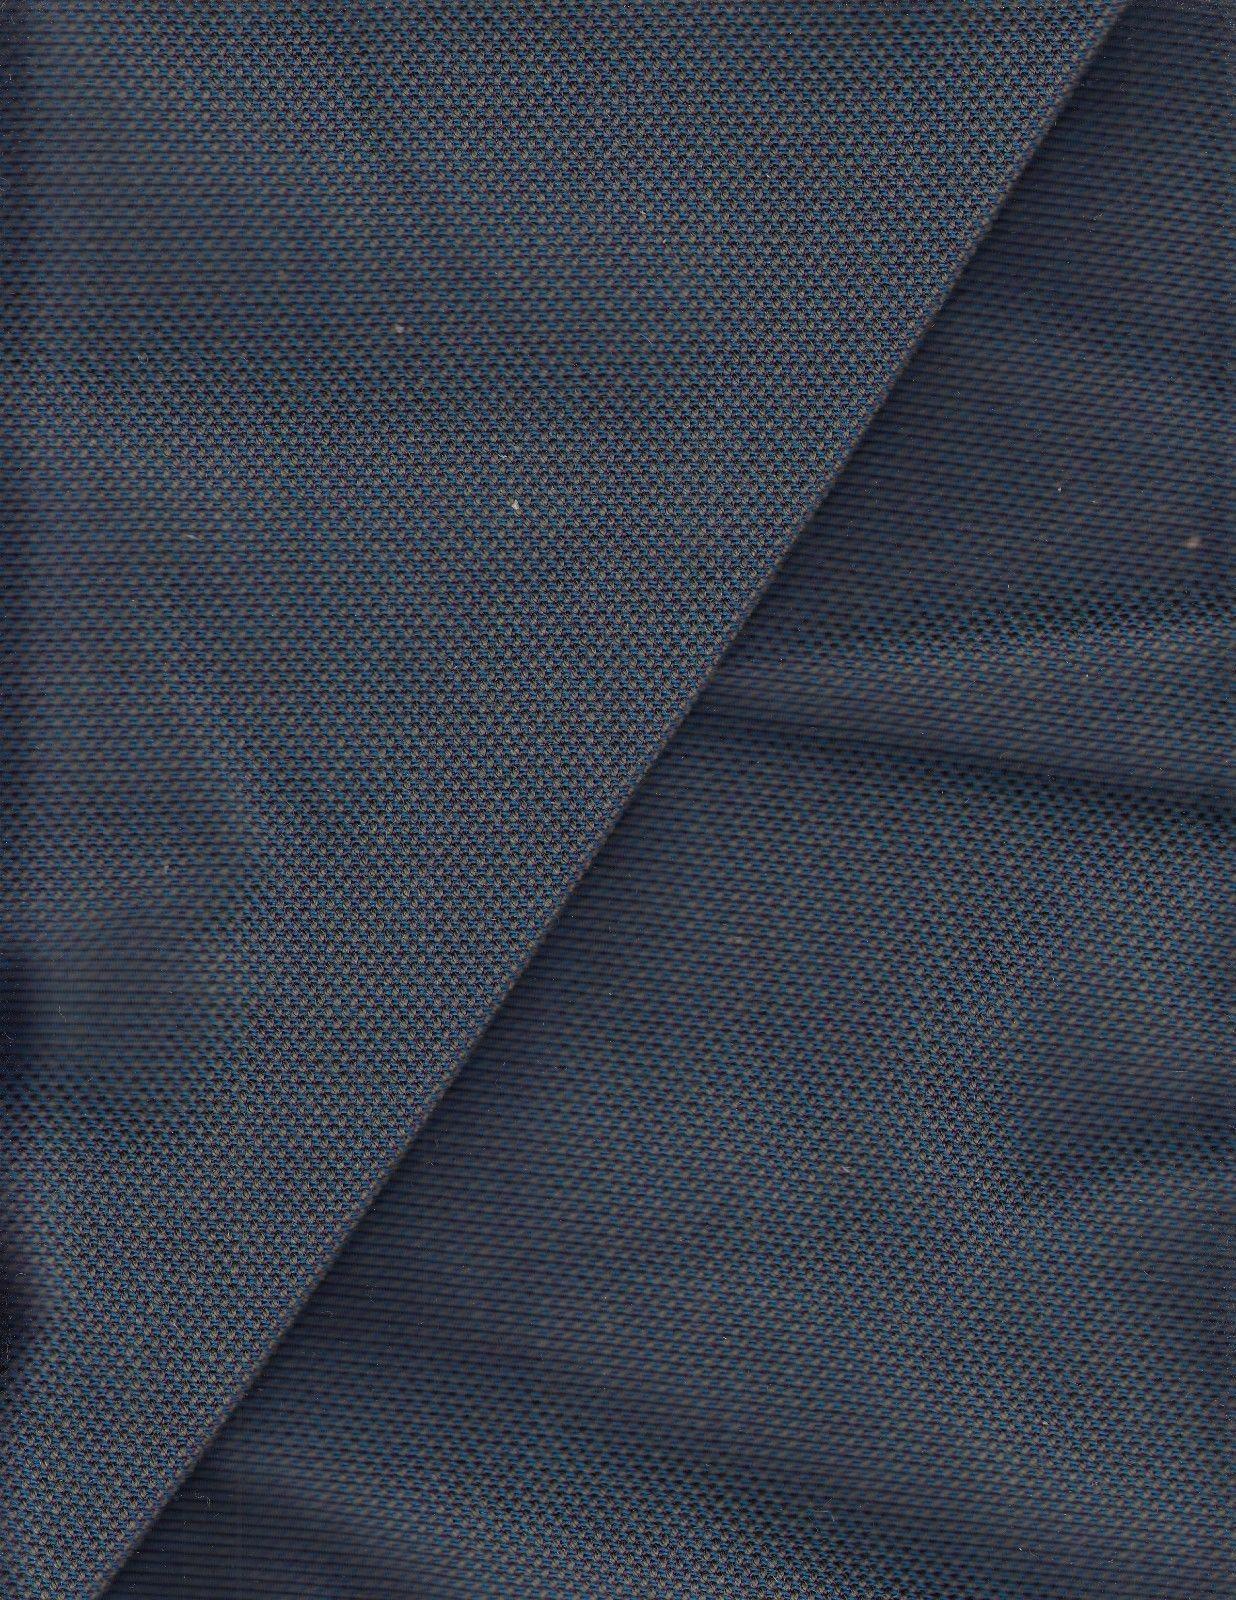 Maharam Upholstery Fabric Steelcut Trio Wool Green Blue 465906-883 1.25 yd DY